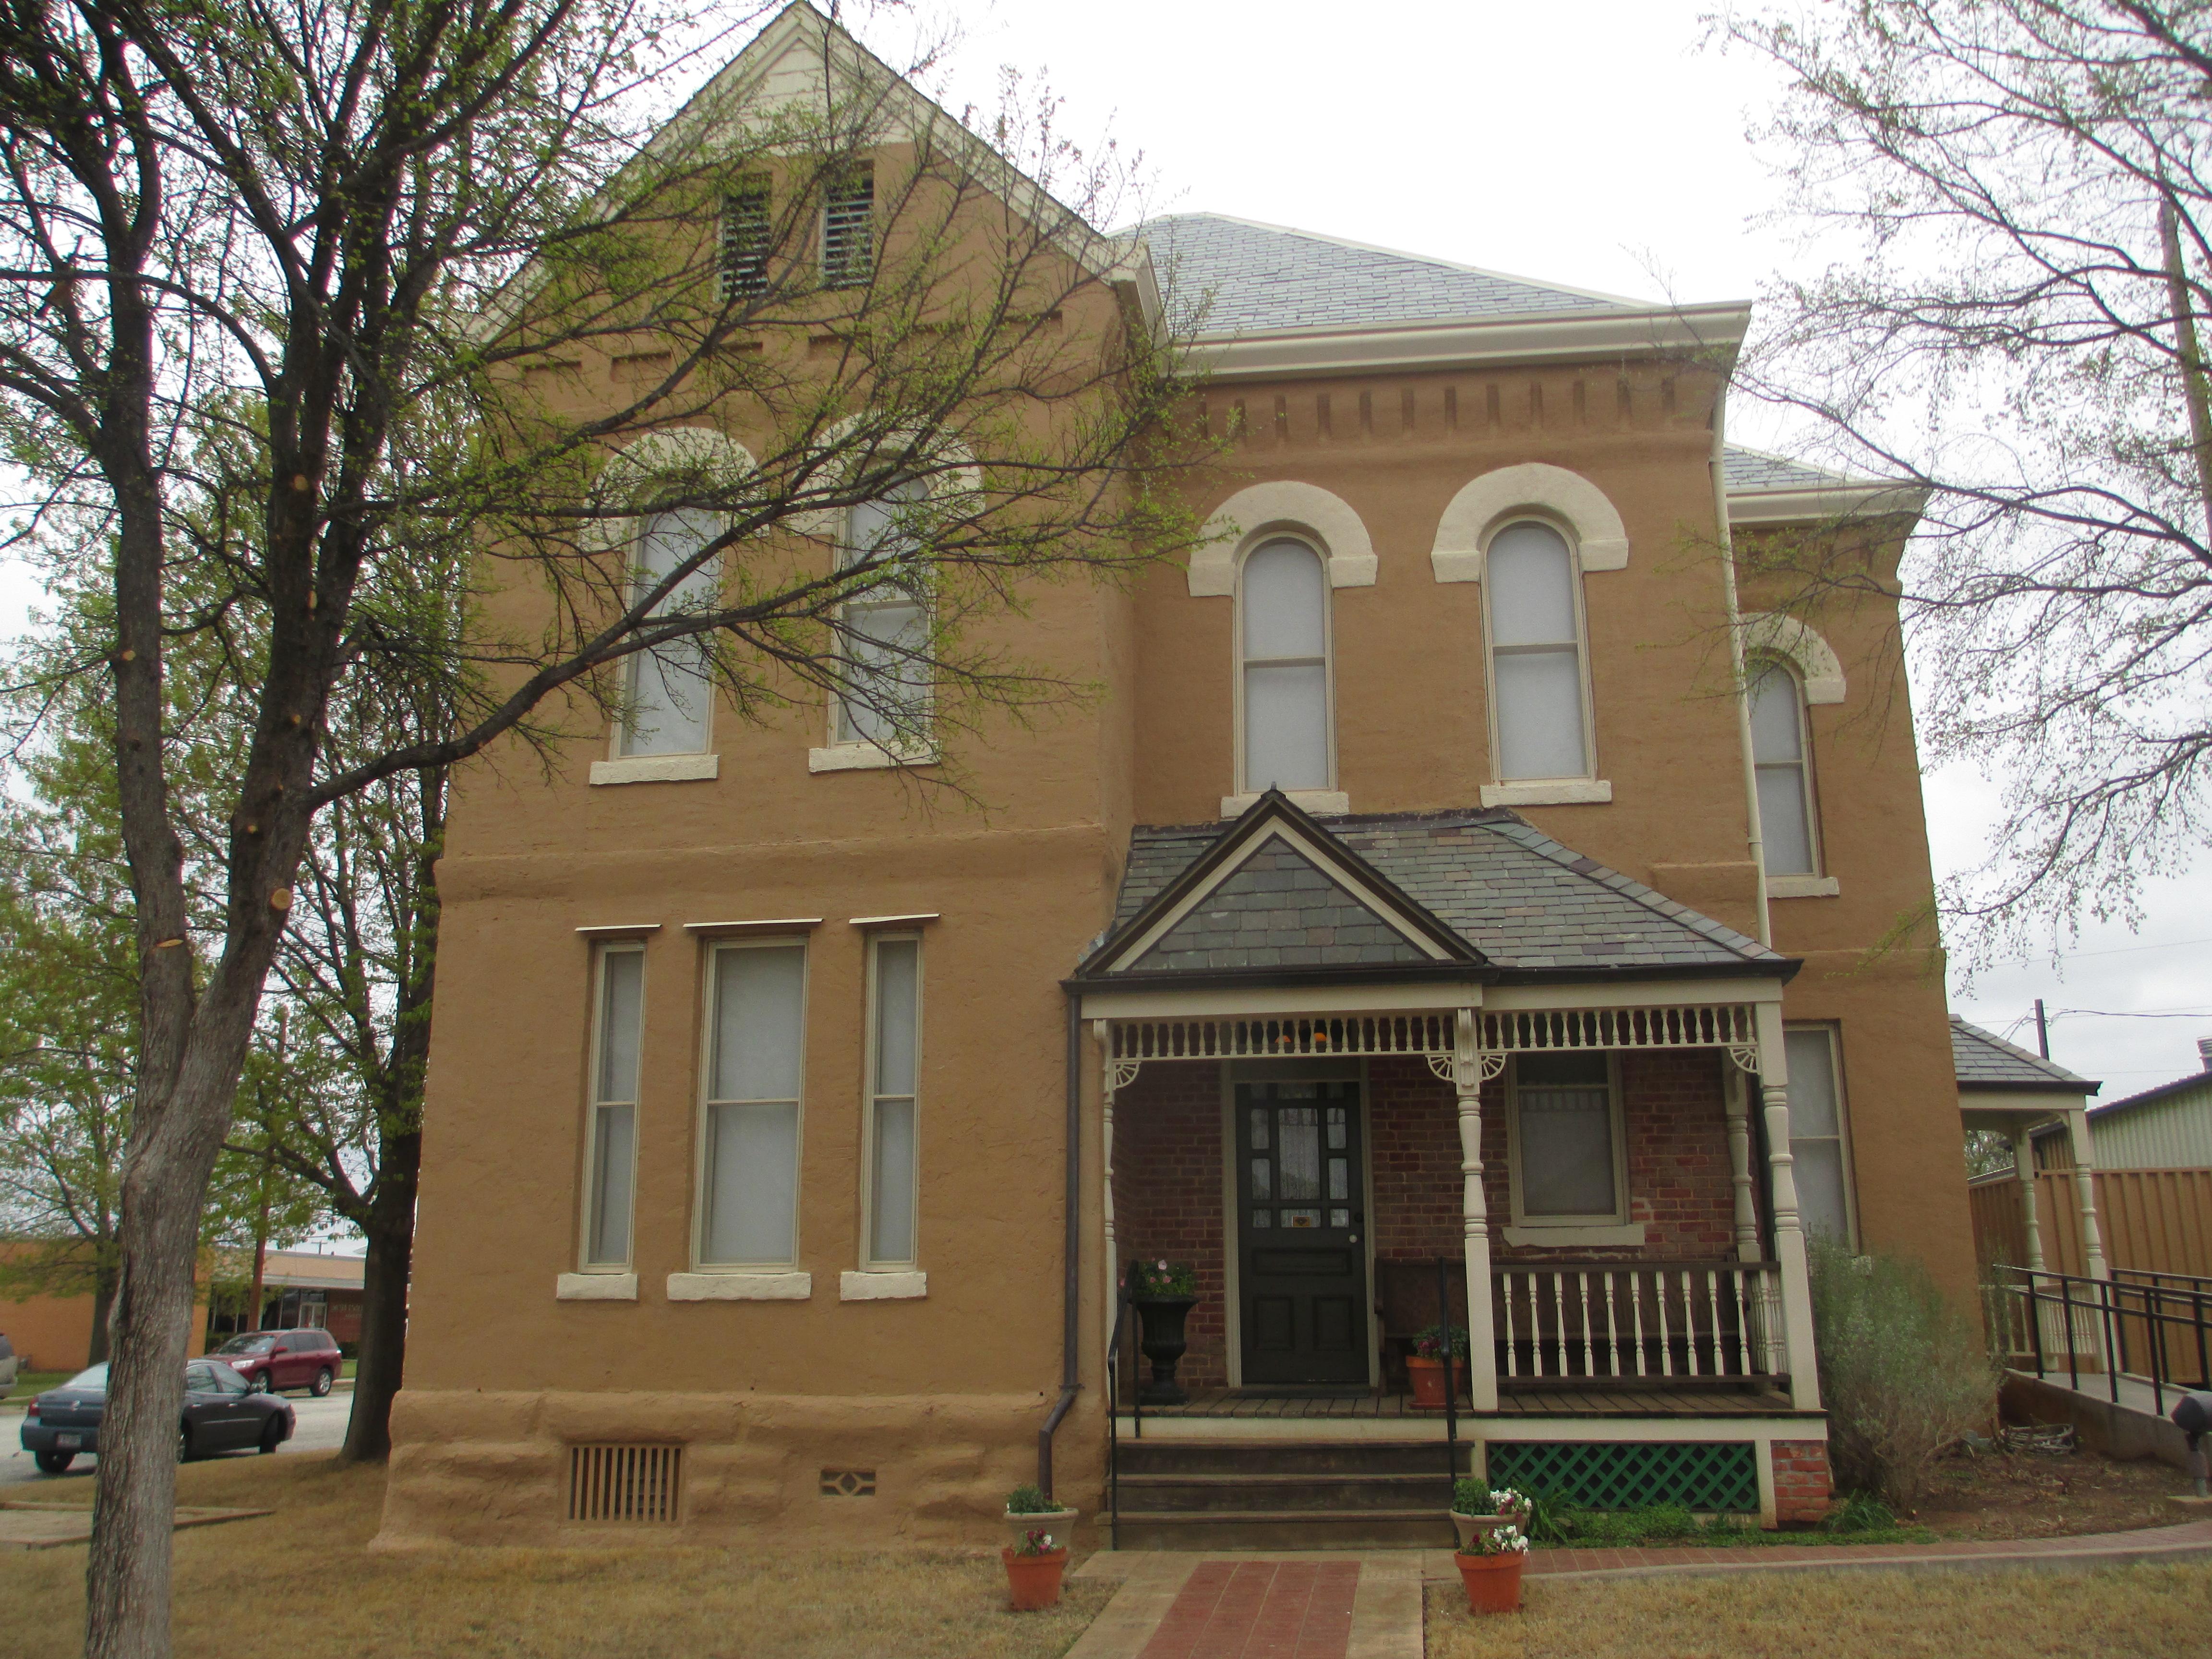 File:Clay County 1890 Jail Museum, Henrietta, tX IMG 6836